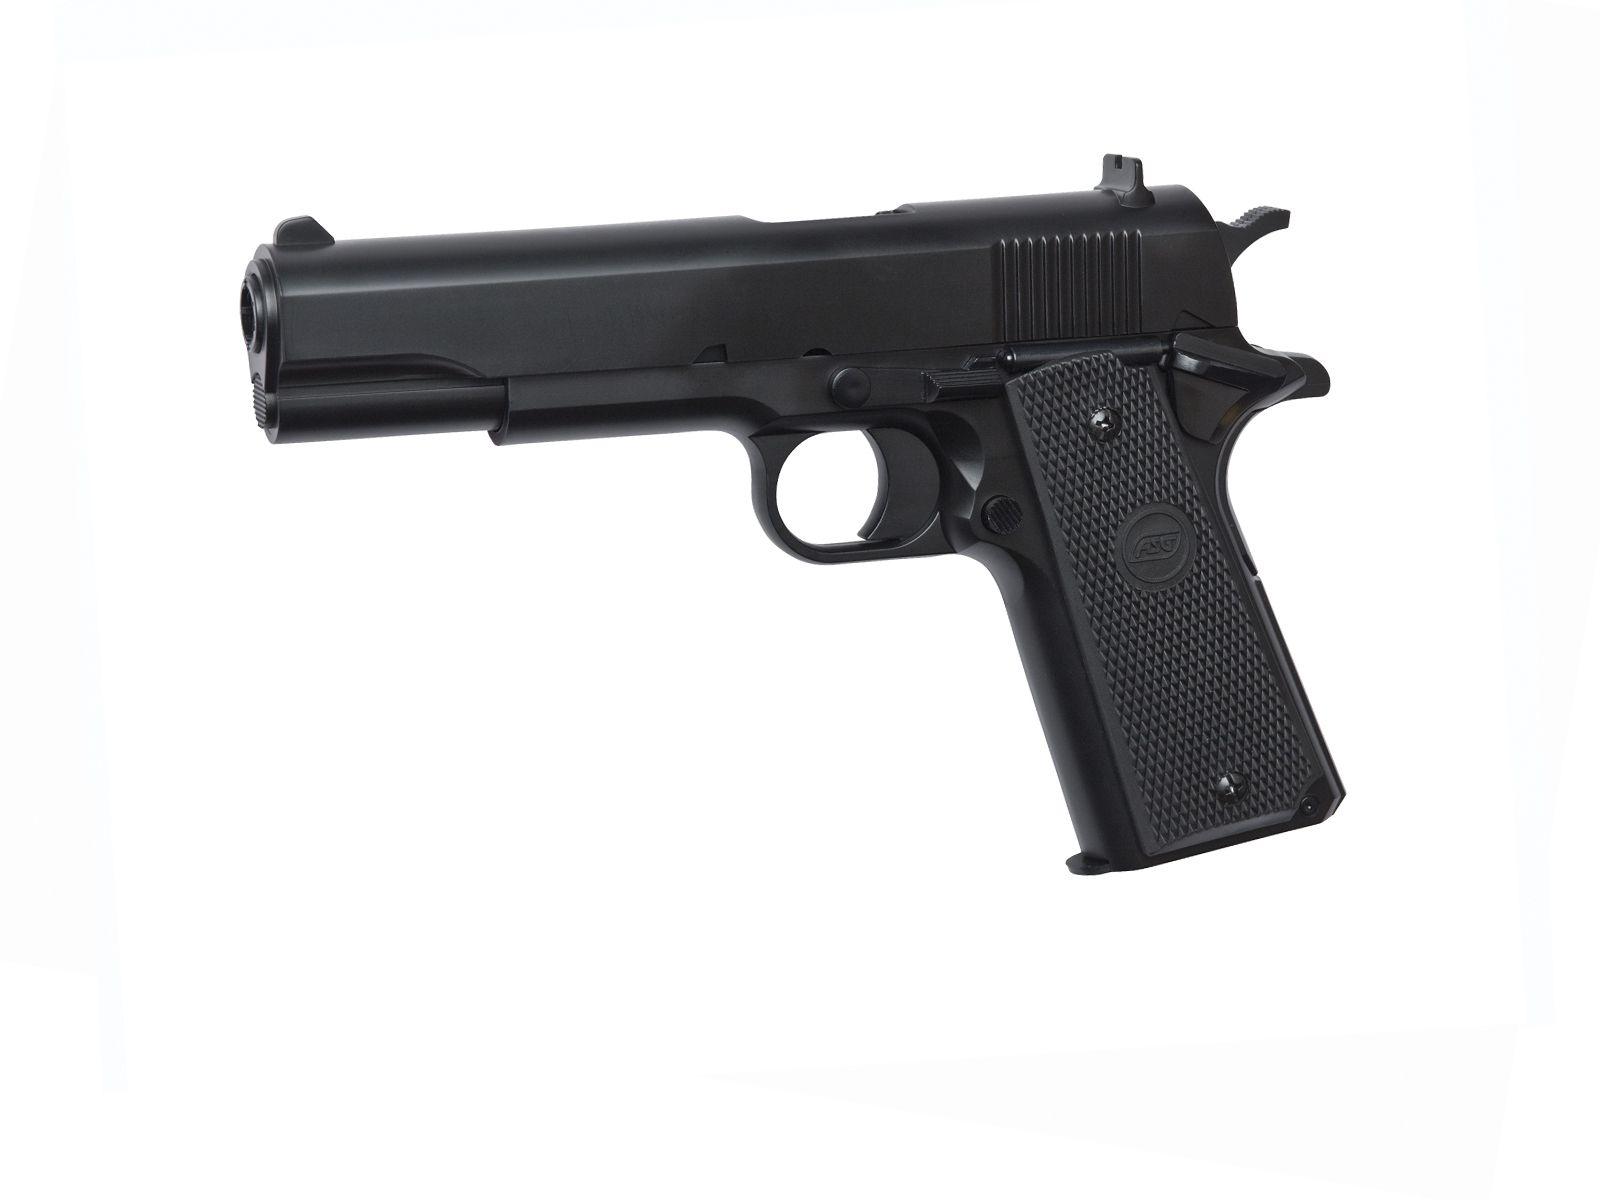 REPLIQUE AIRSOFT A RESSORT M1911 - ASG